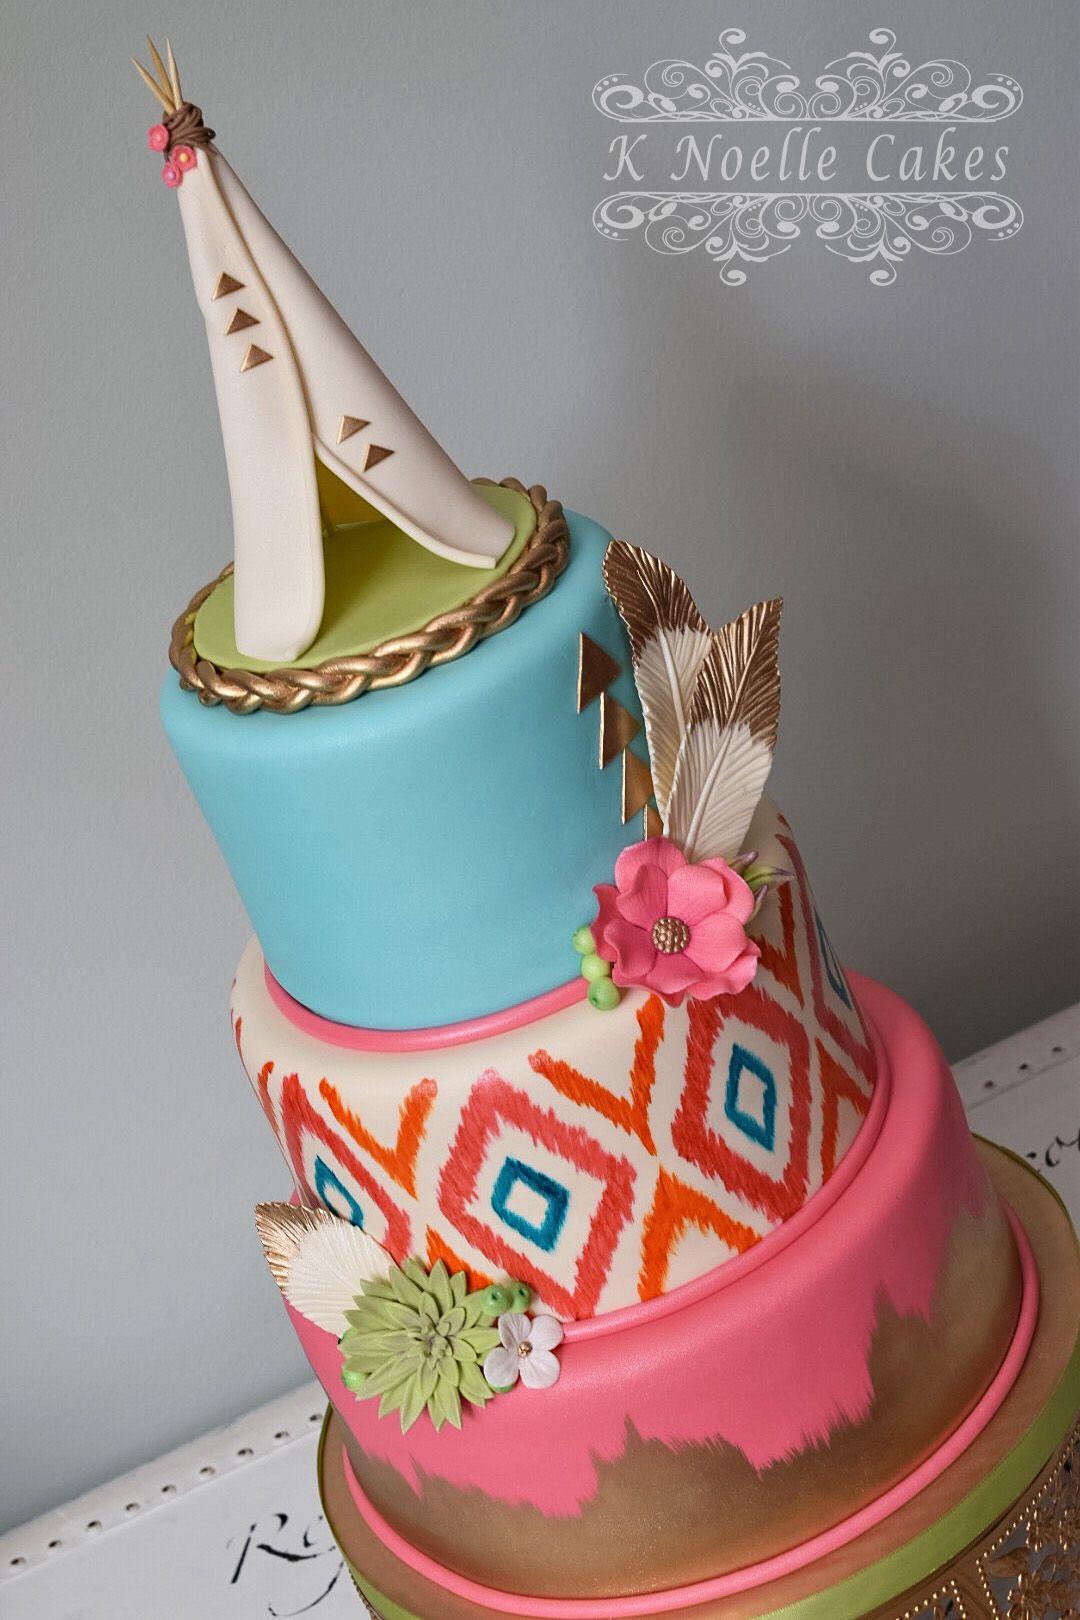 Bohemian Chic Cake By K Noelle Cakes